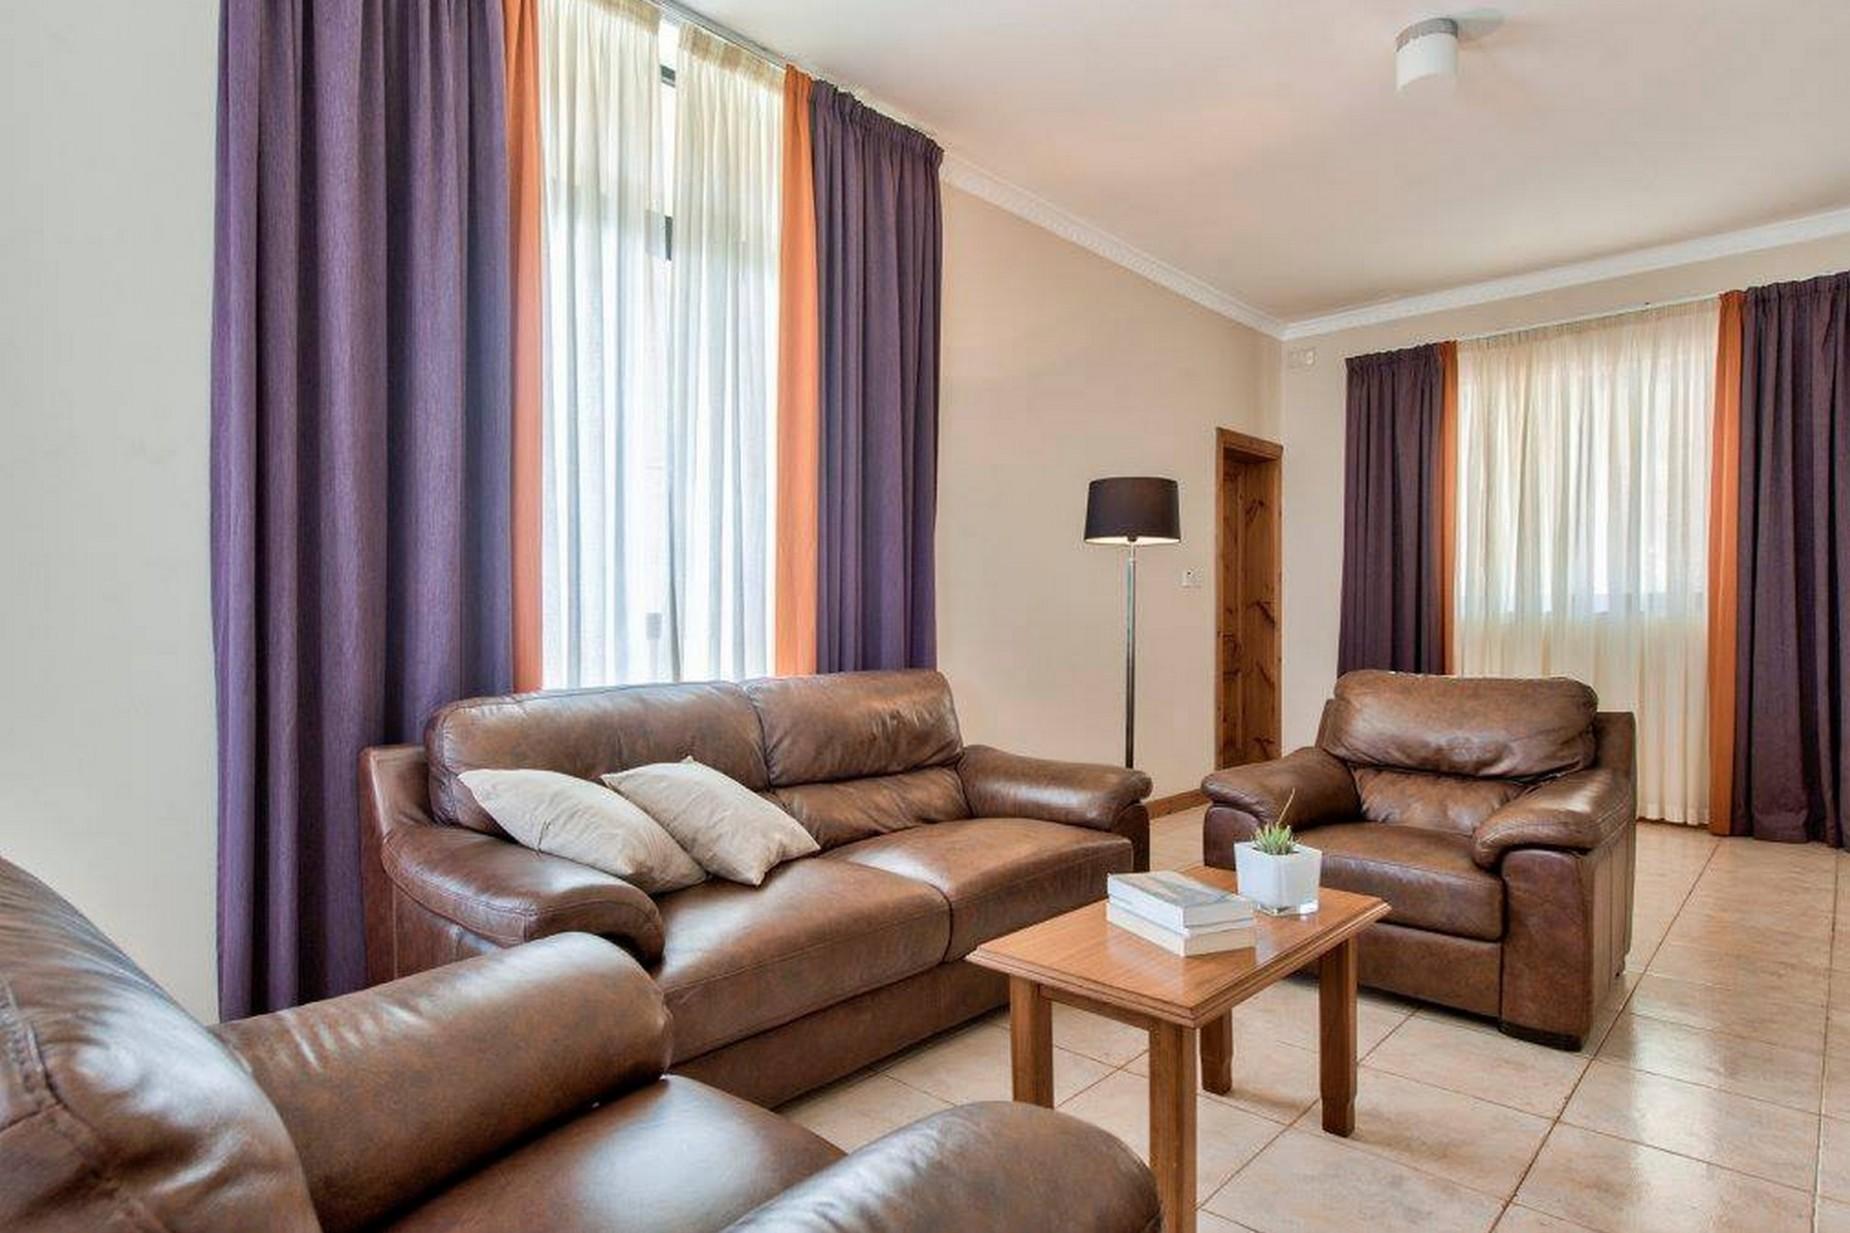 5 bed Villa For Rent in Mellieha, Mellieha - thumb 4